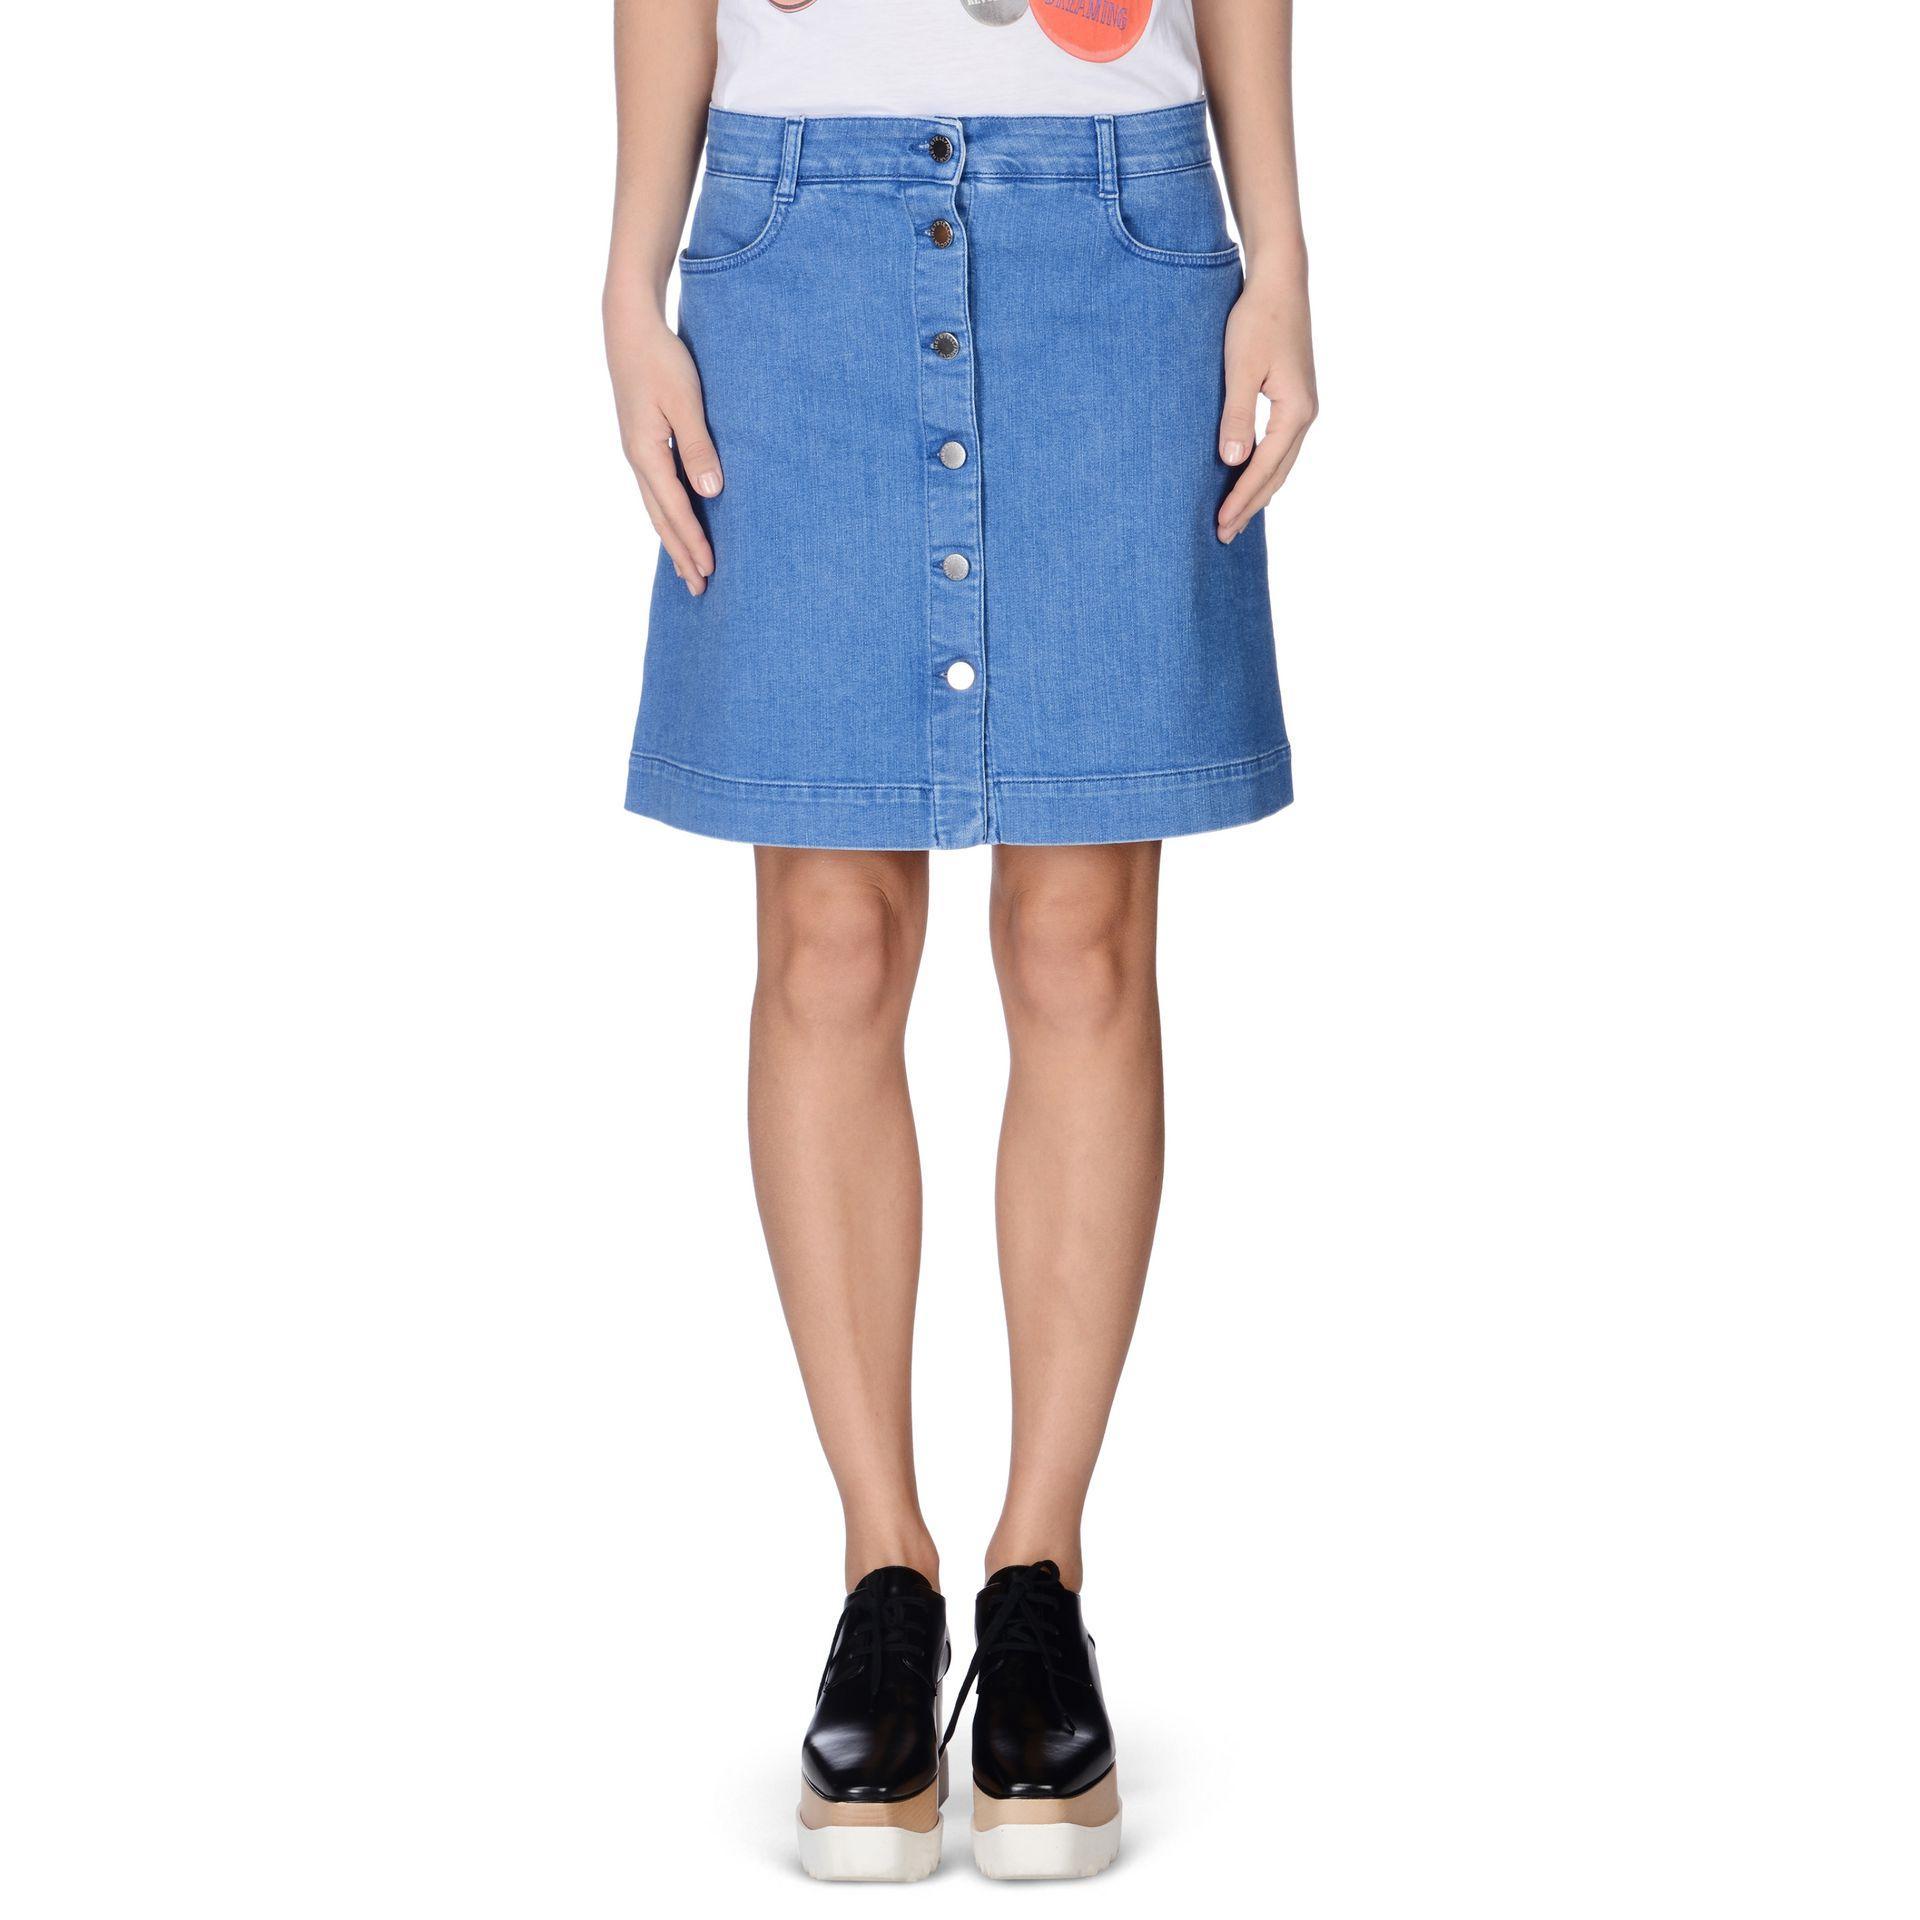 stella mccartney supreme blue denim skirt in blue lyst